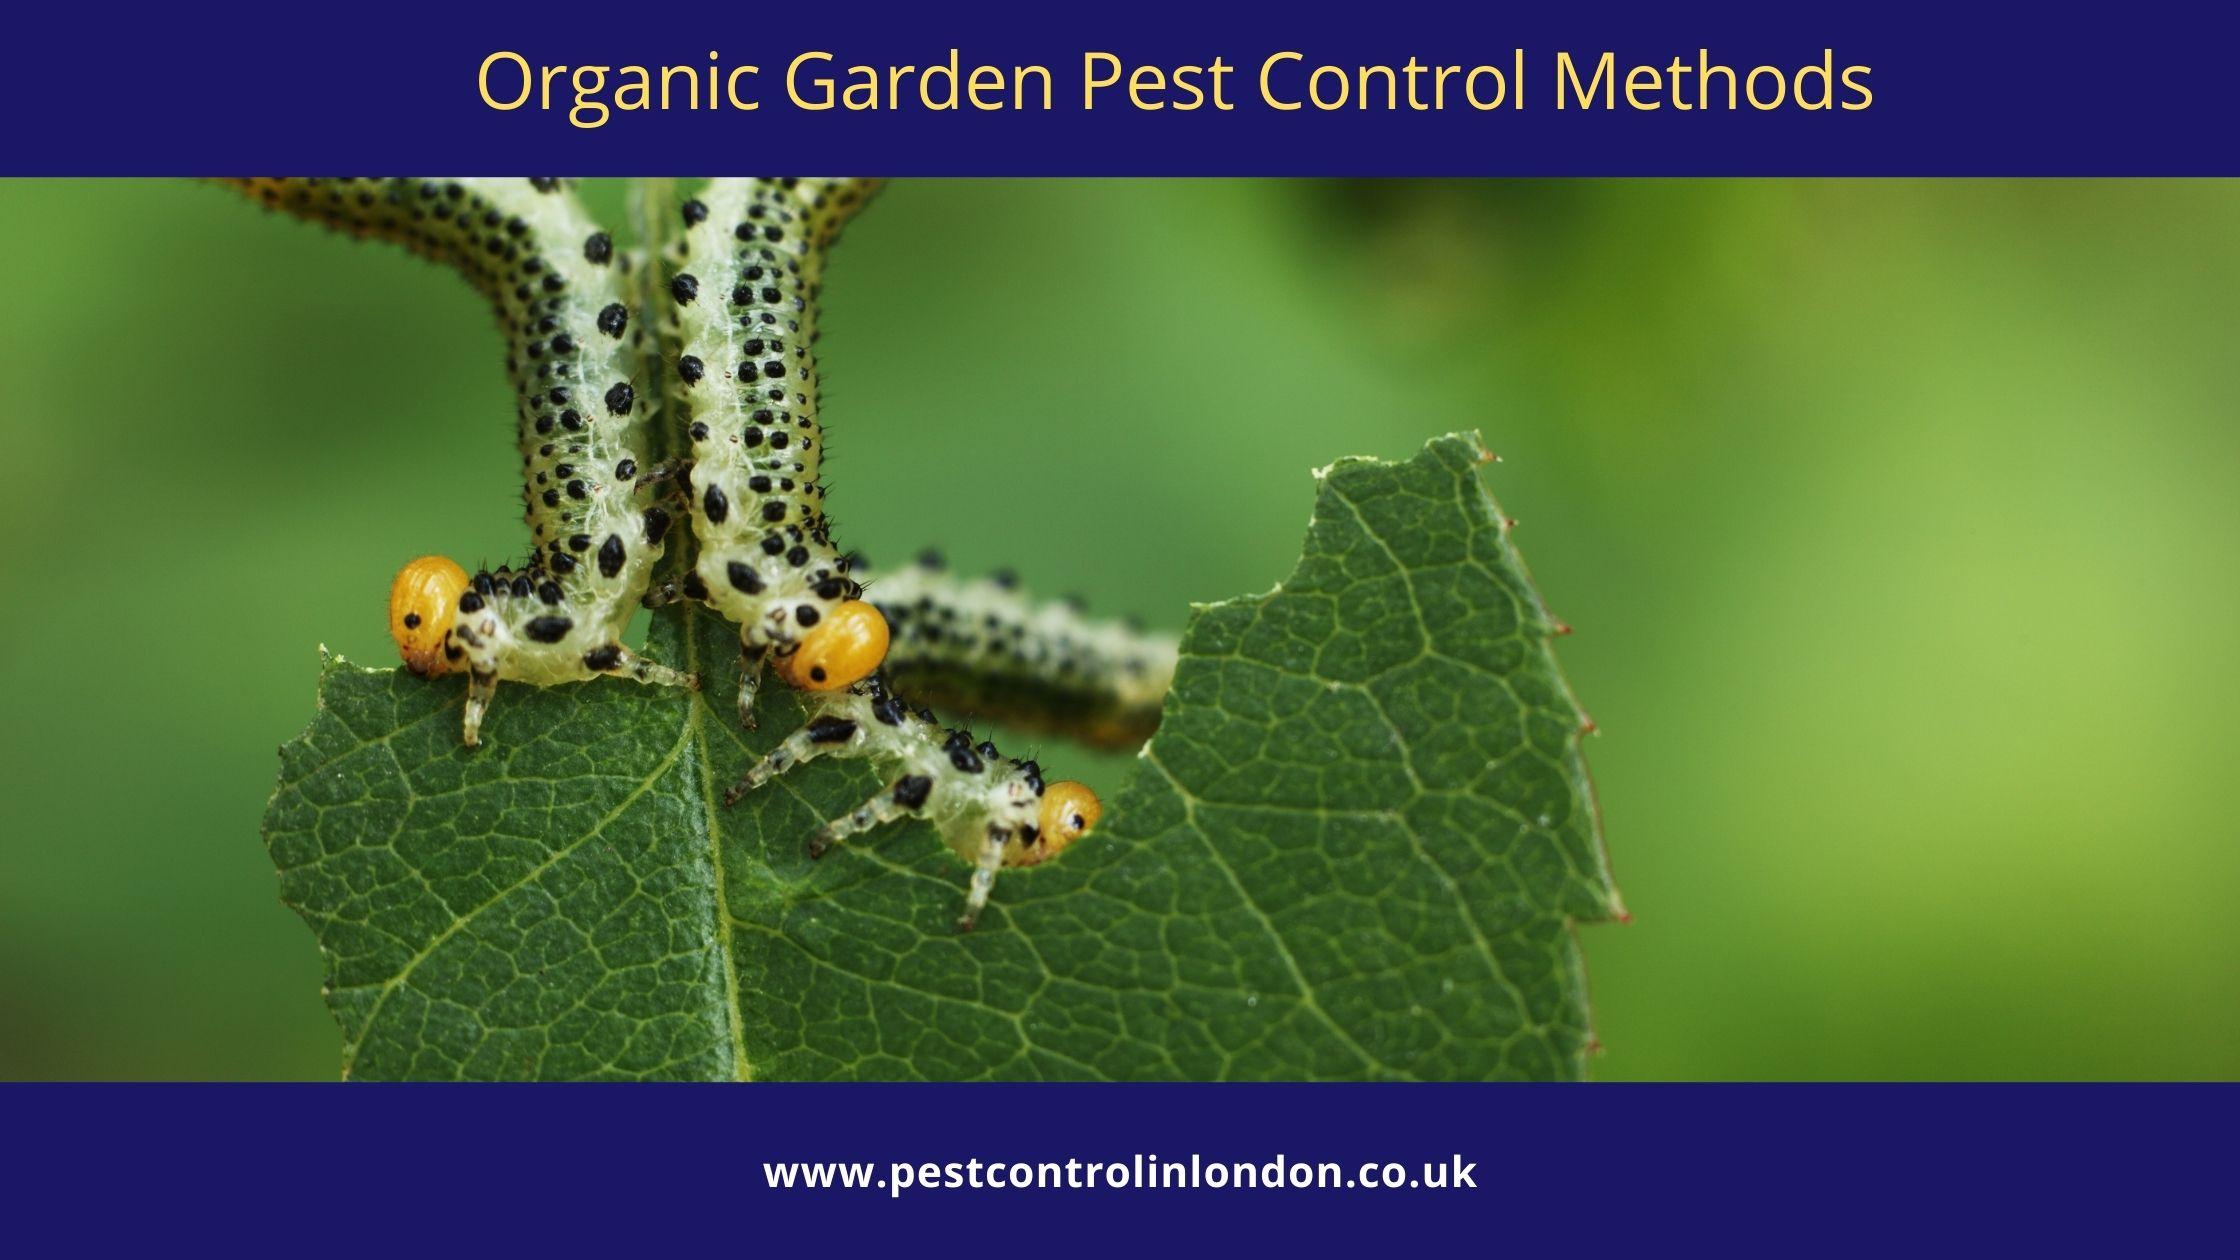 Organic Garden Pest Control Methods